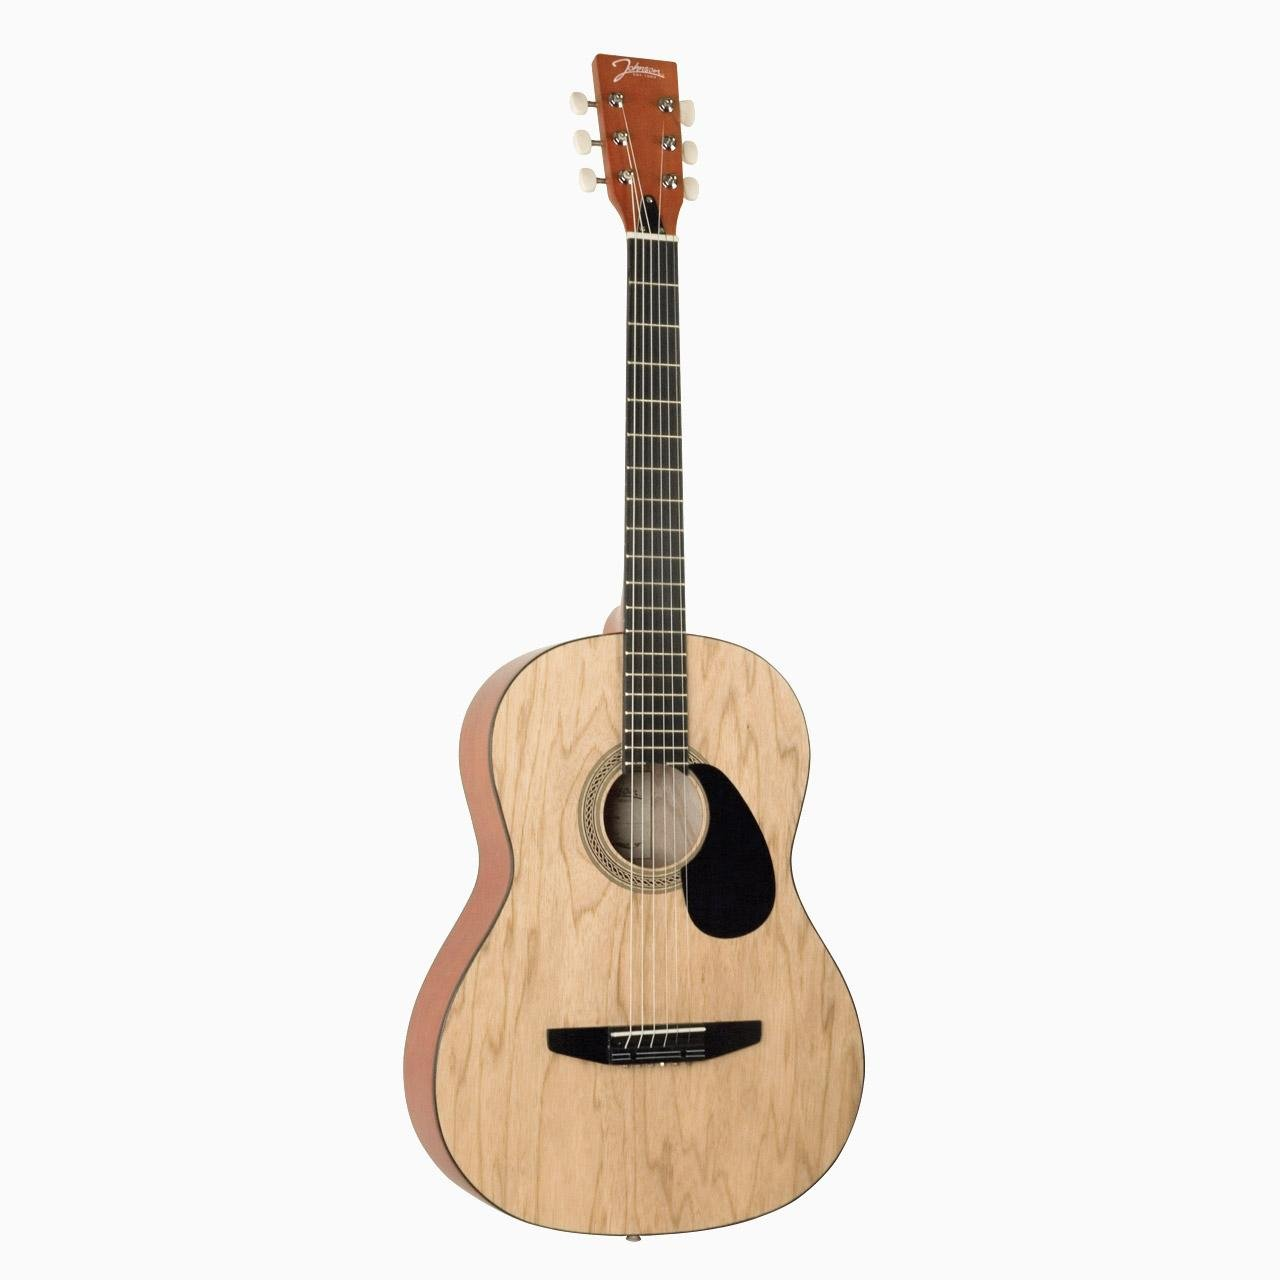 Johnson JG-100 Student Small Body Acoustic Guitar